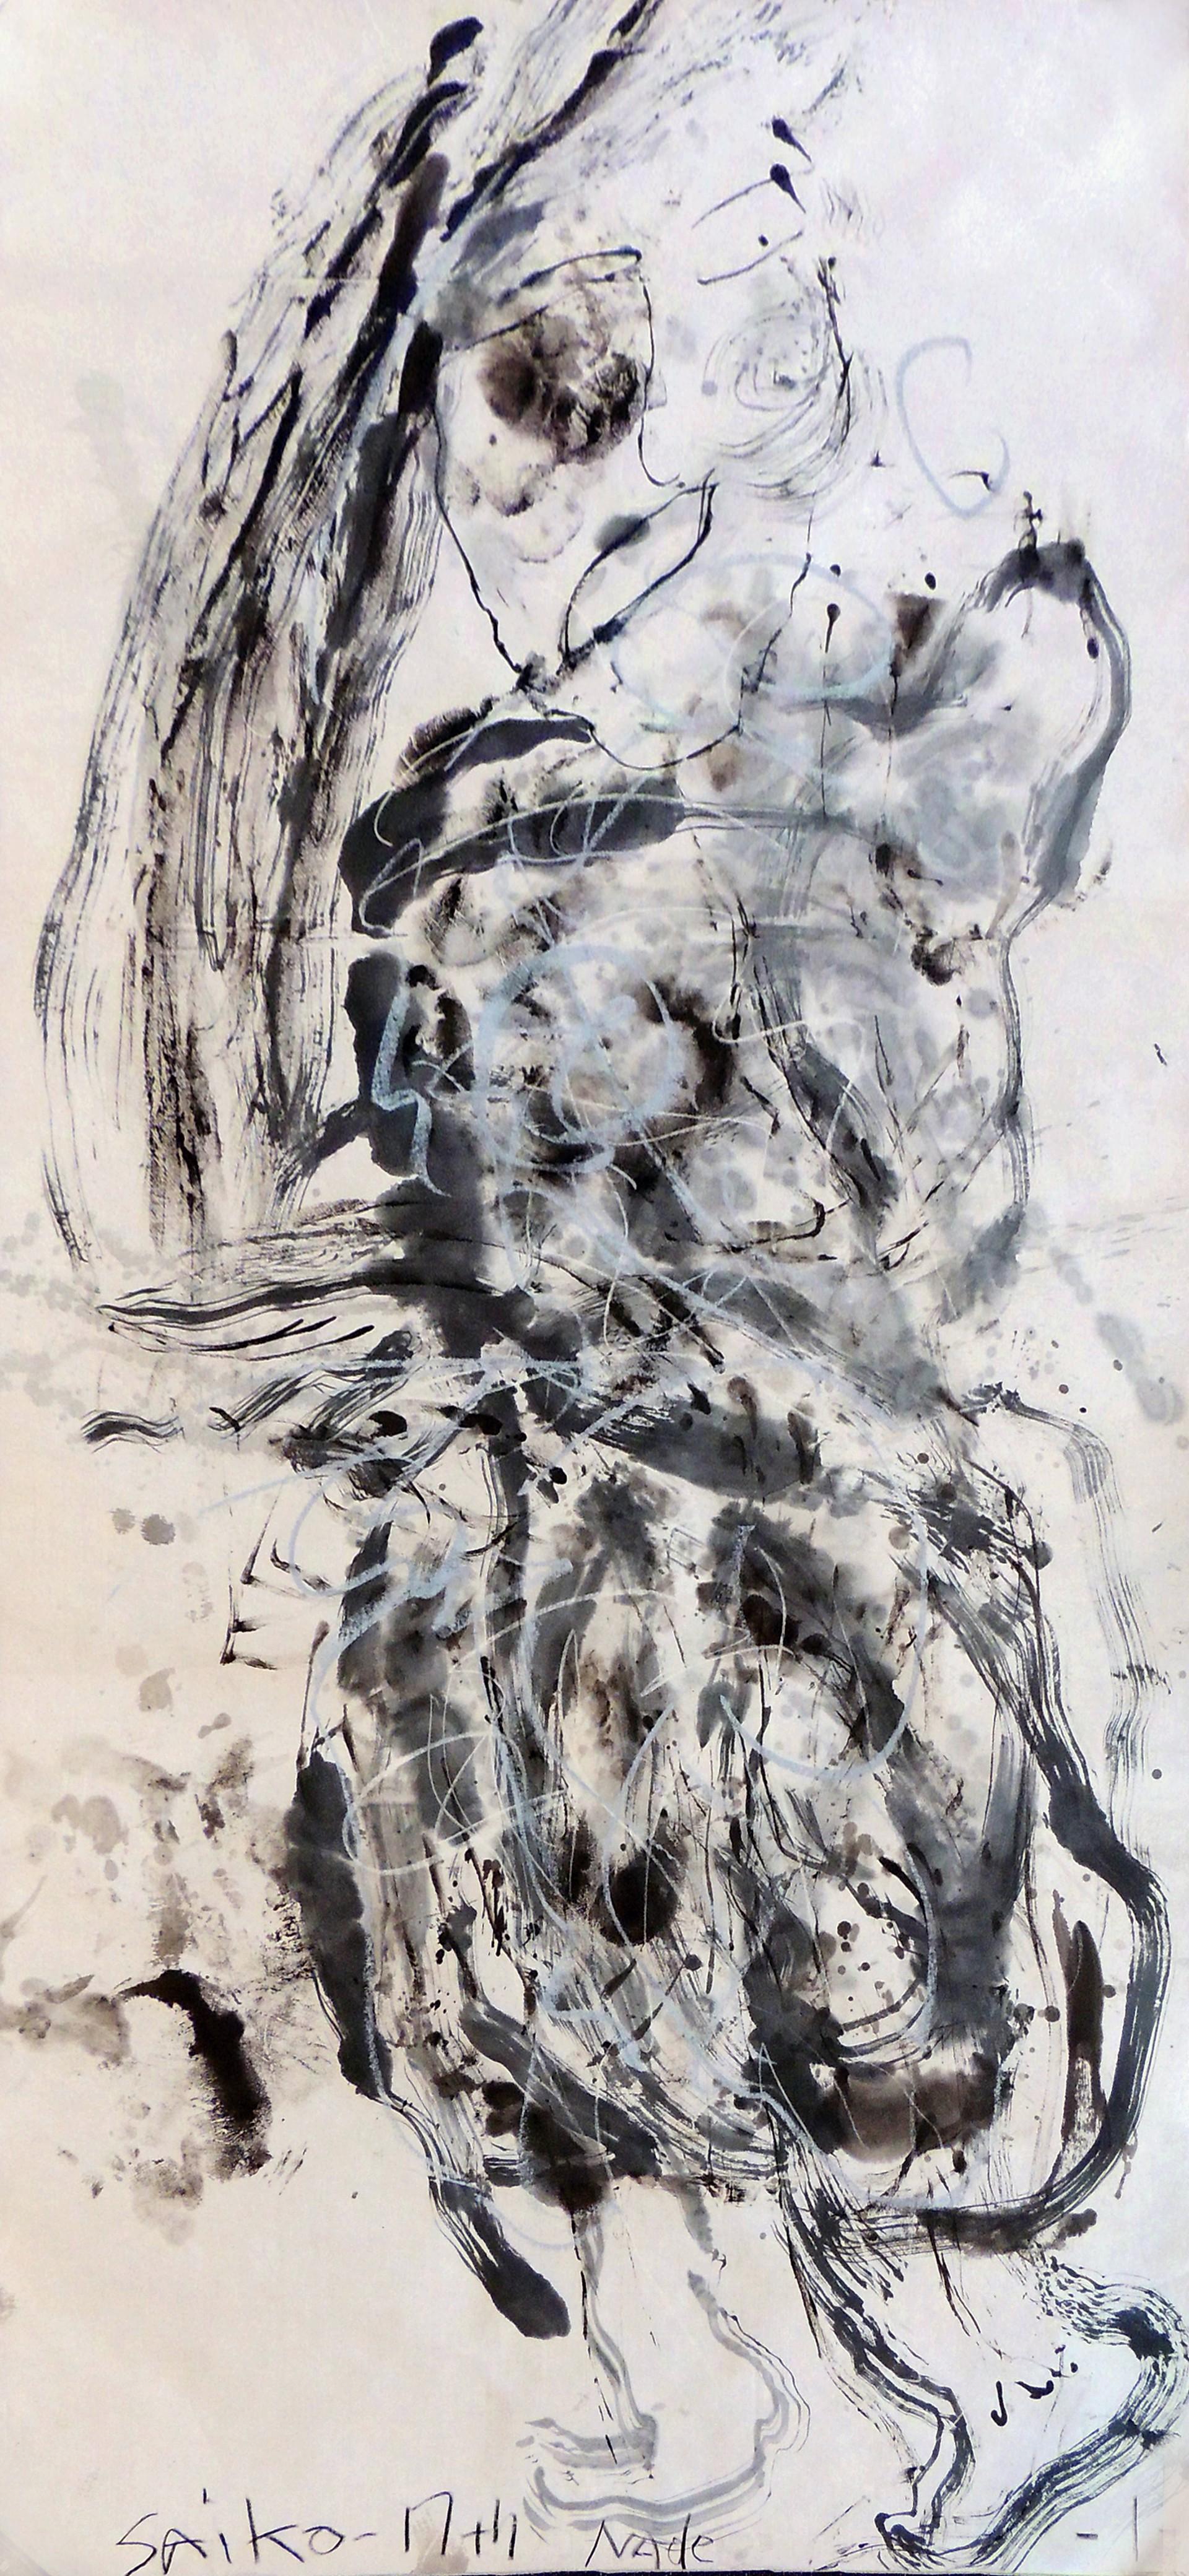 saiko - 17th nade #1 by Alan Lau